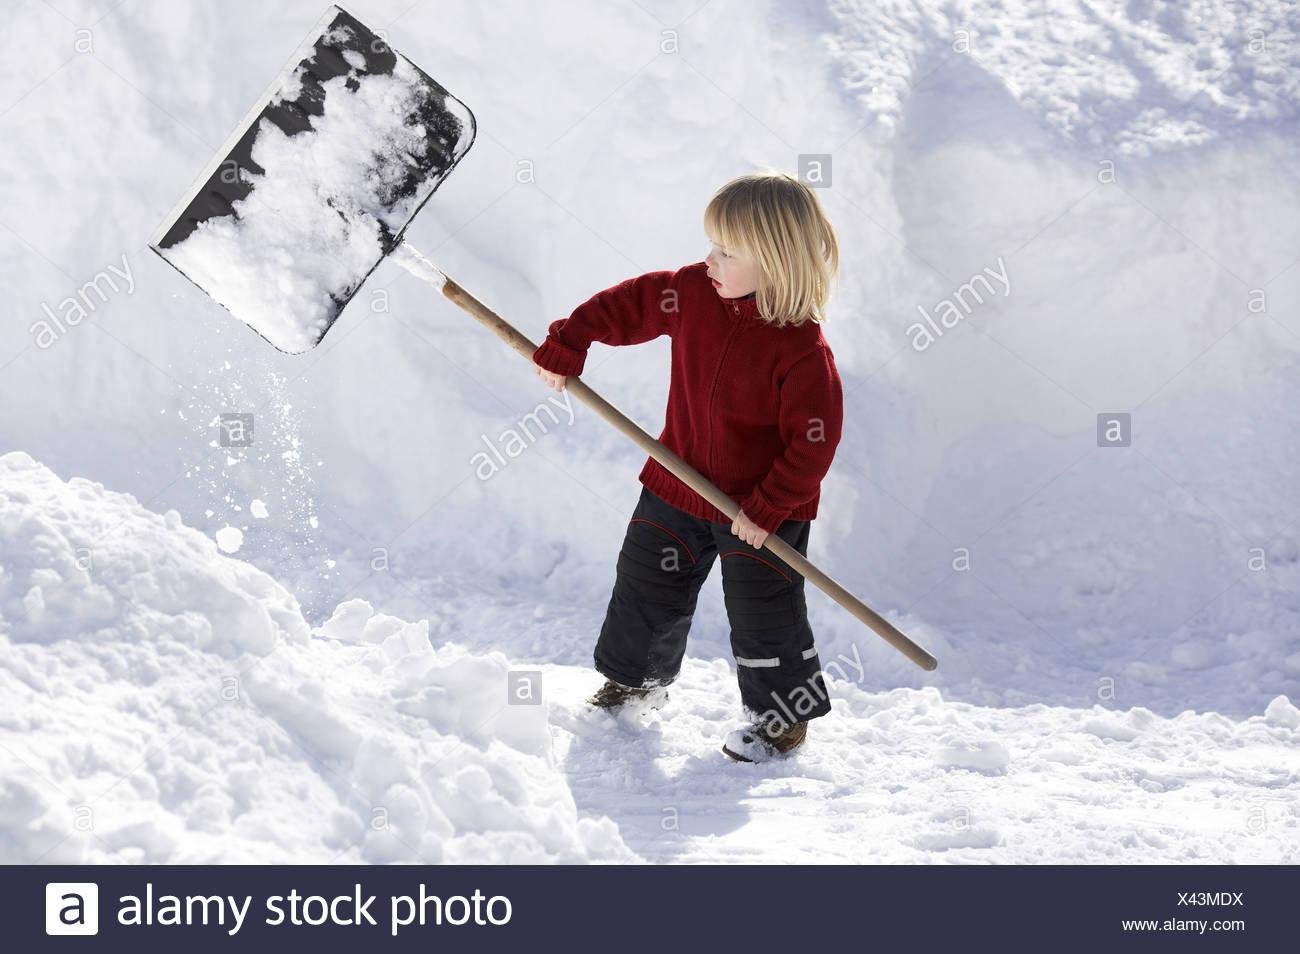 Give birth winter-clothing snow-shovels 4 years child blond ski-pants snow-shovel shovel holds shovels snow-evacuates plays - Stock Image